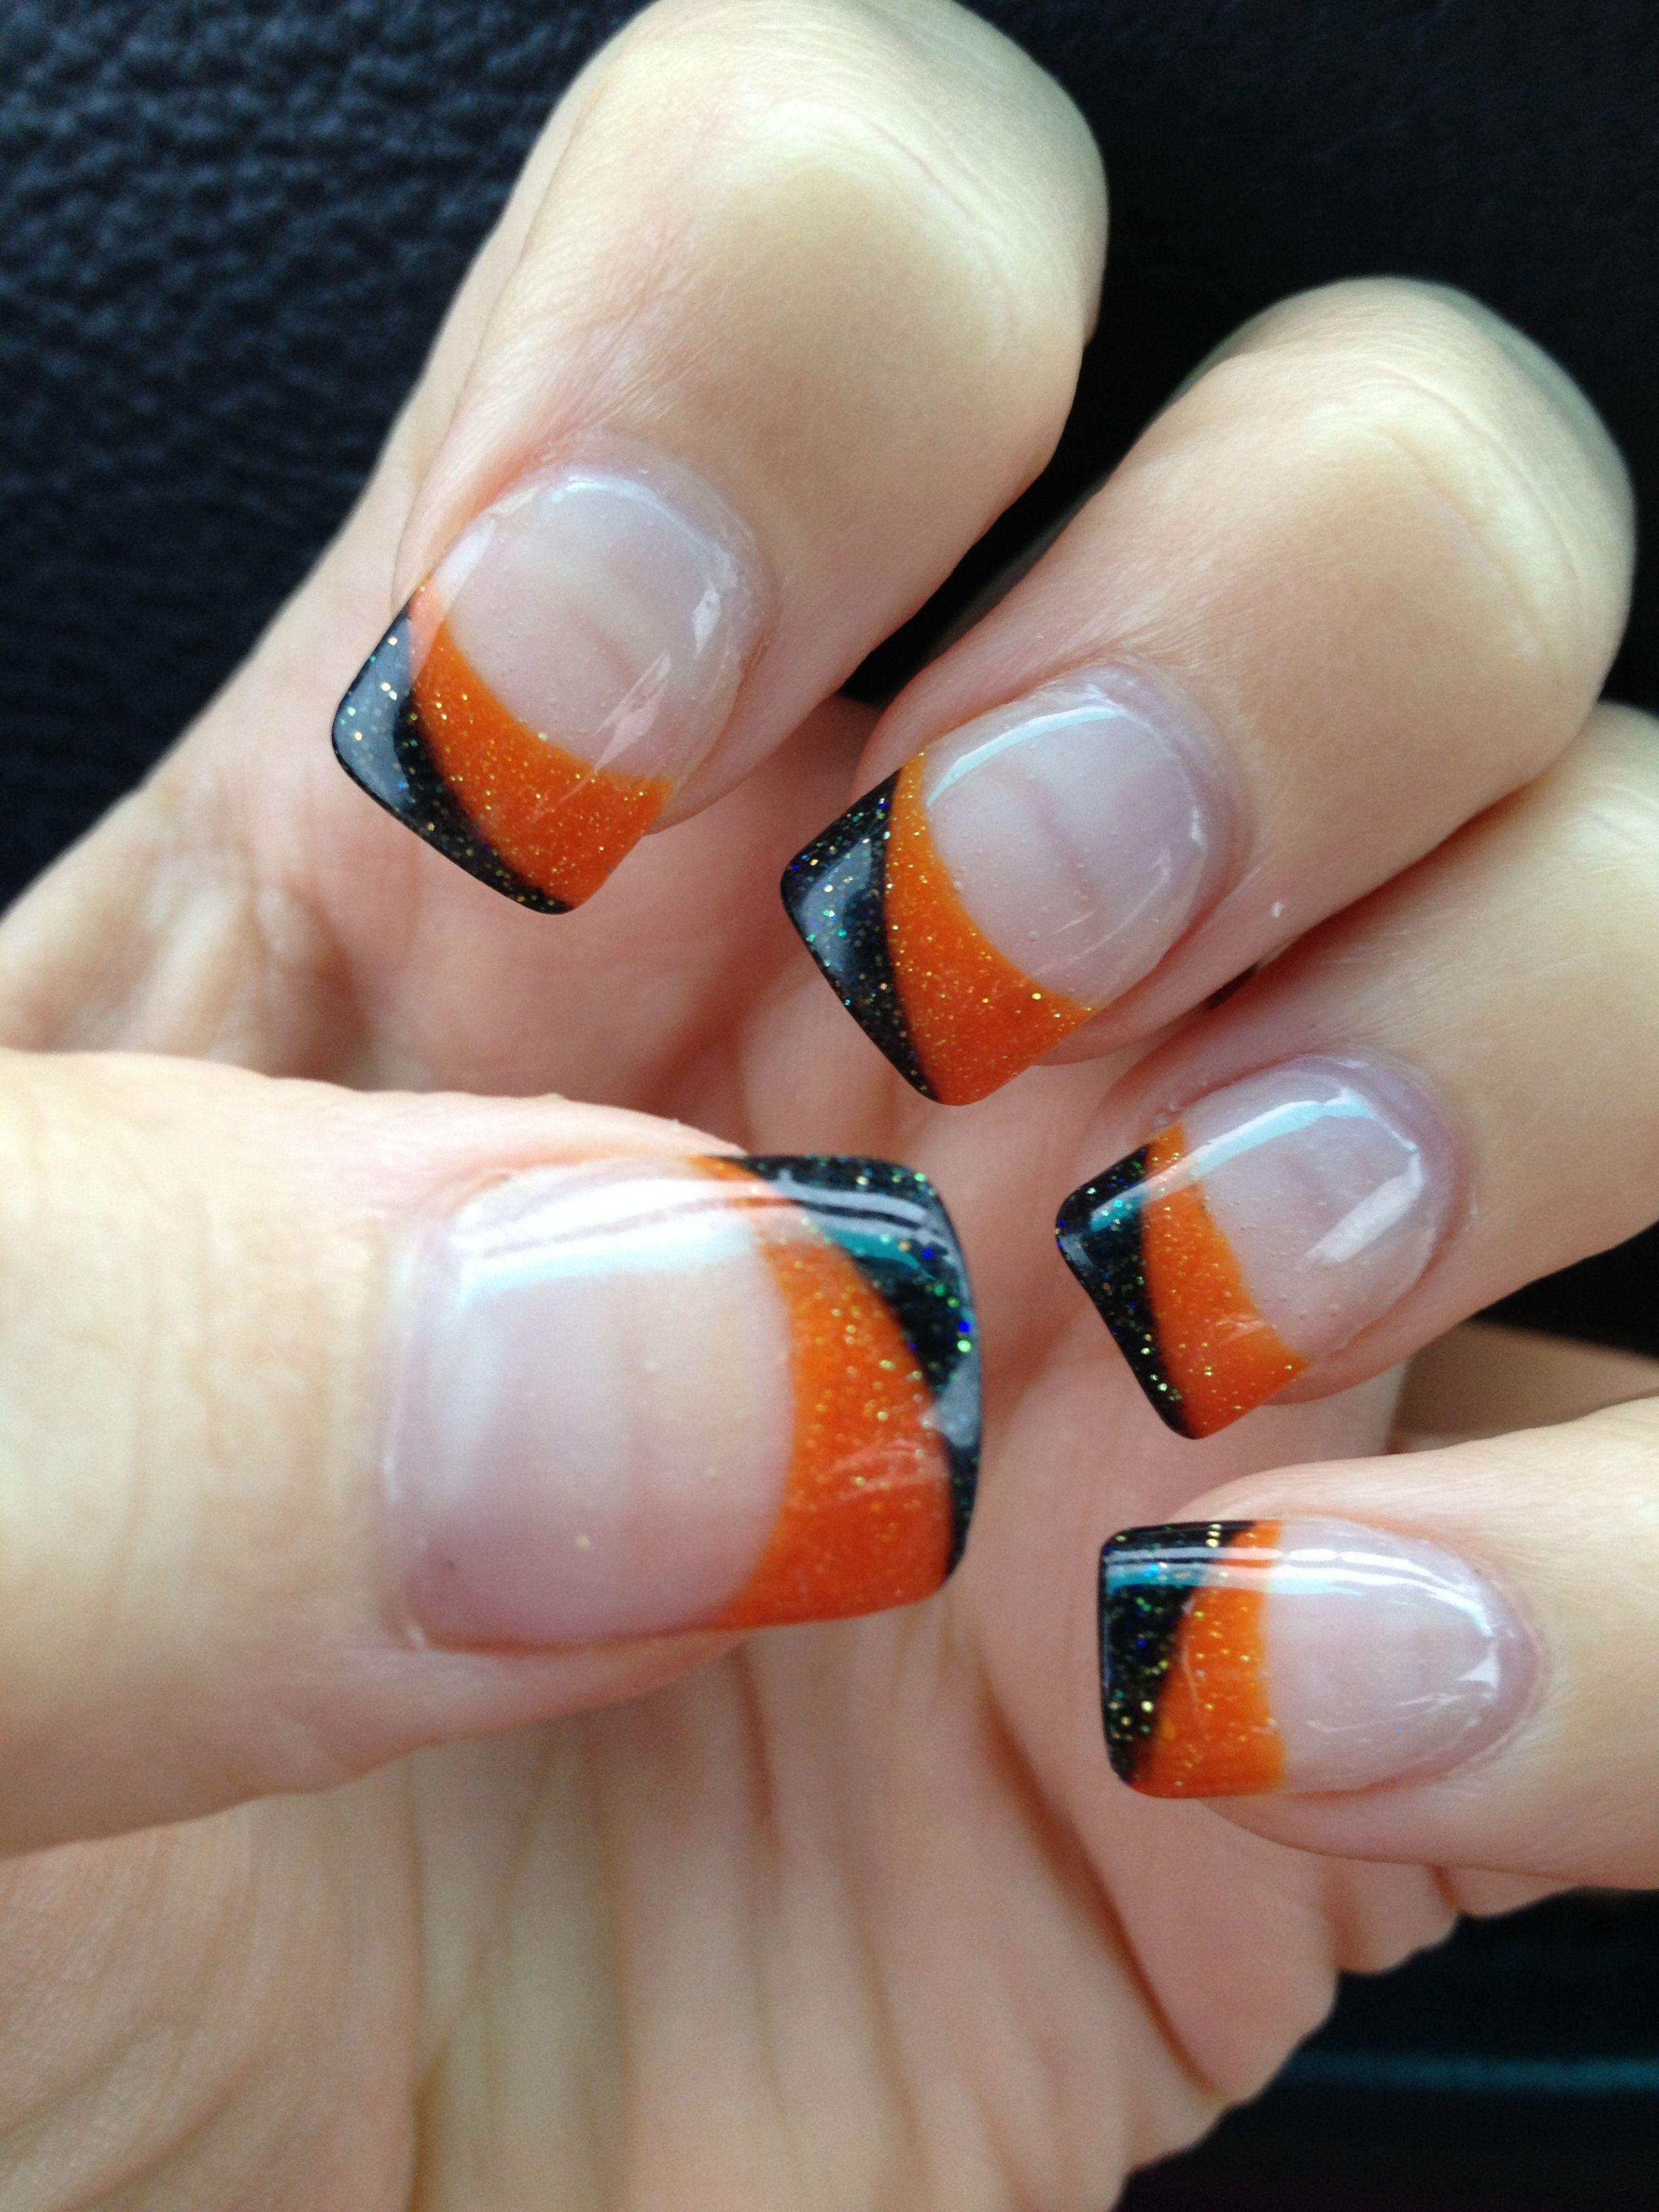 Halloween Acrylic Nails Black Orange Sparkley Halloween Acrylic Nails Halloween Nail Designs Holloween Nails